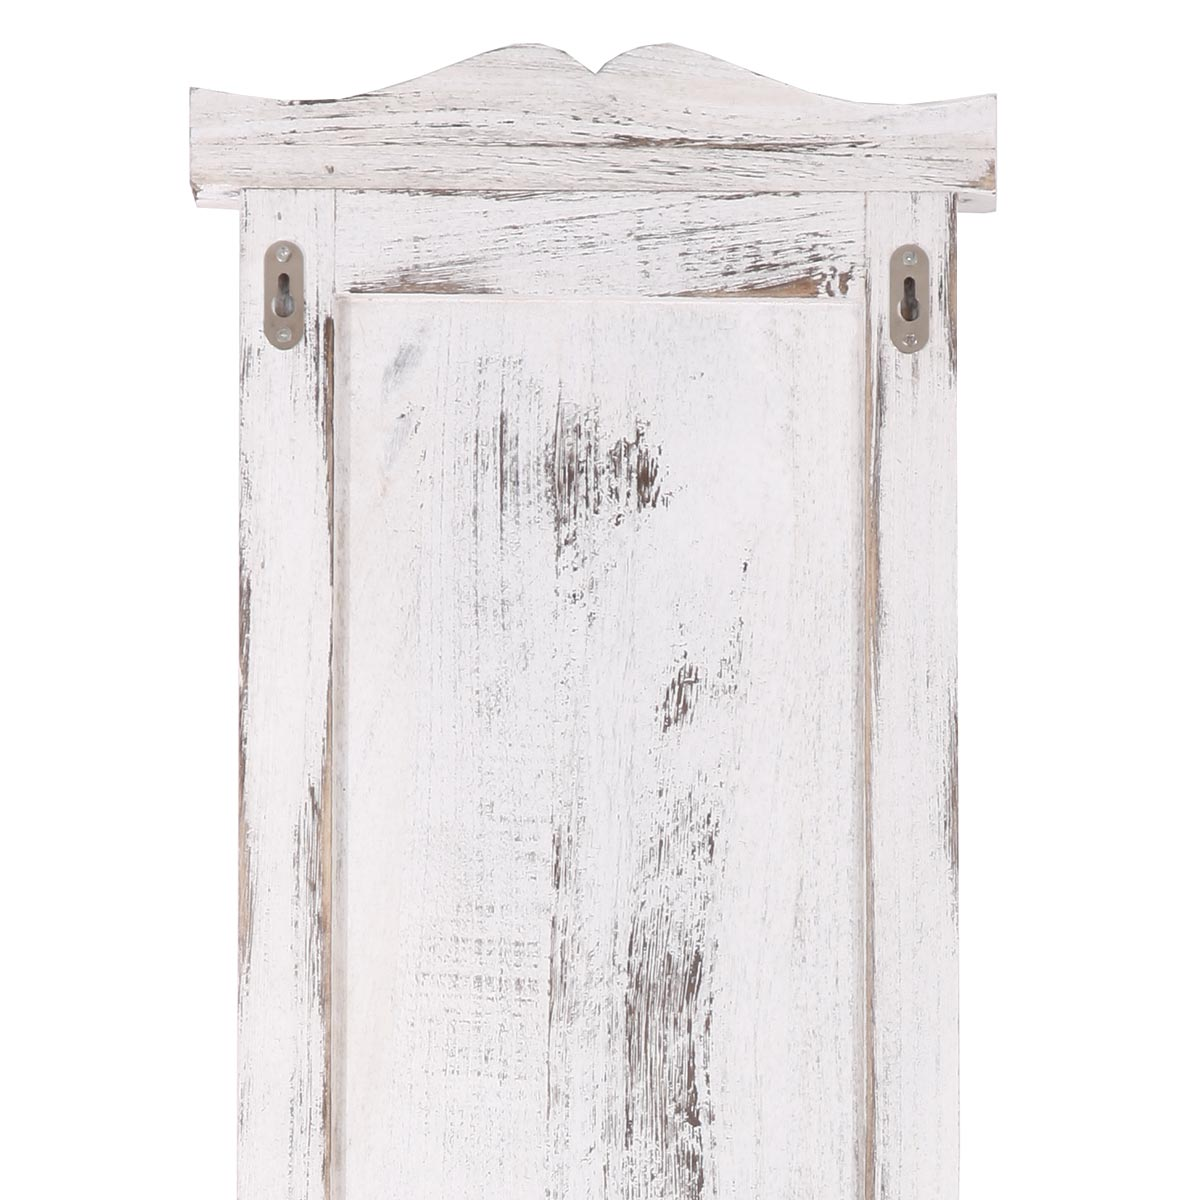 2x wandgarderobe shabby 109cm vintage weiss. Black Bedroom Furniture Sets. Home Design Ideas